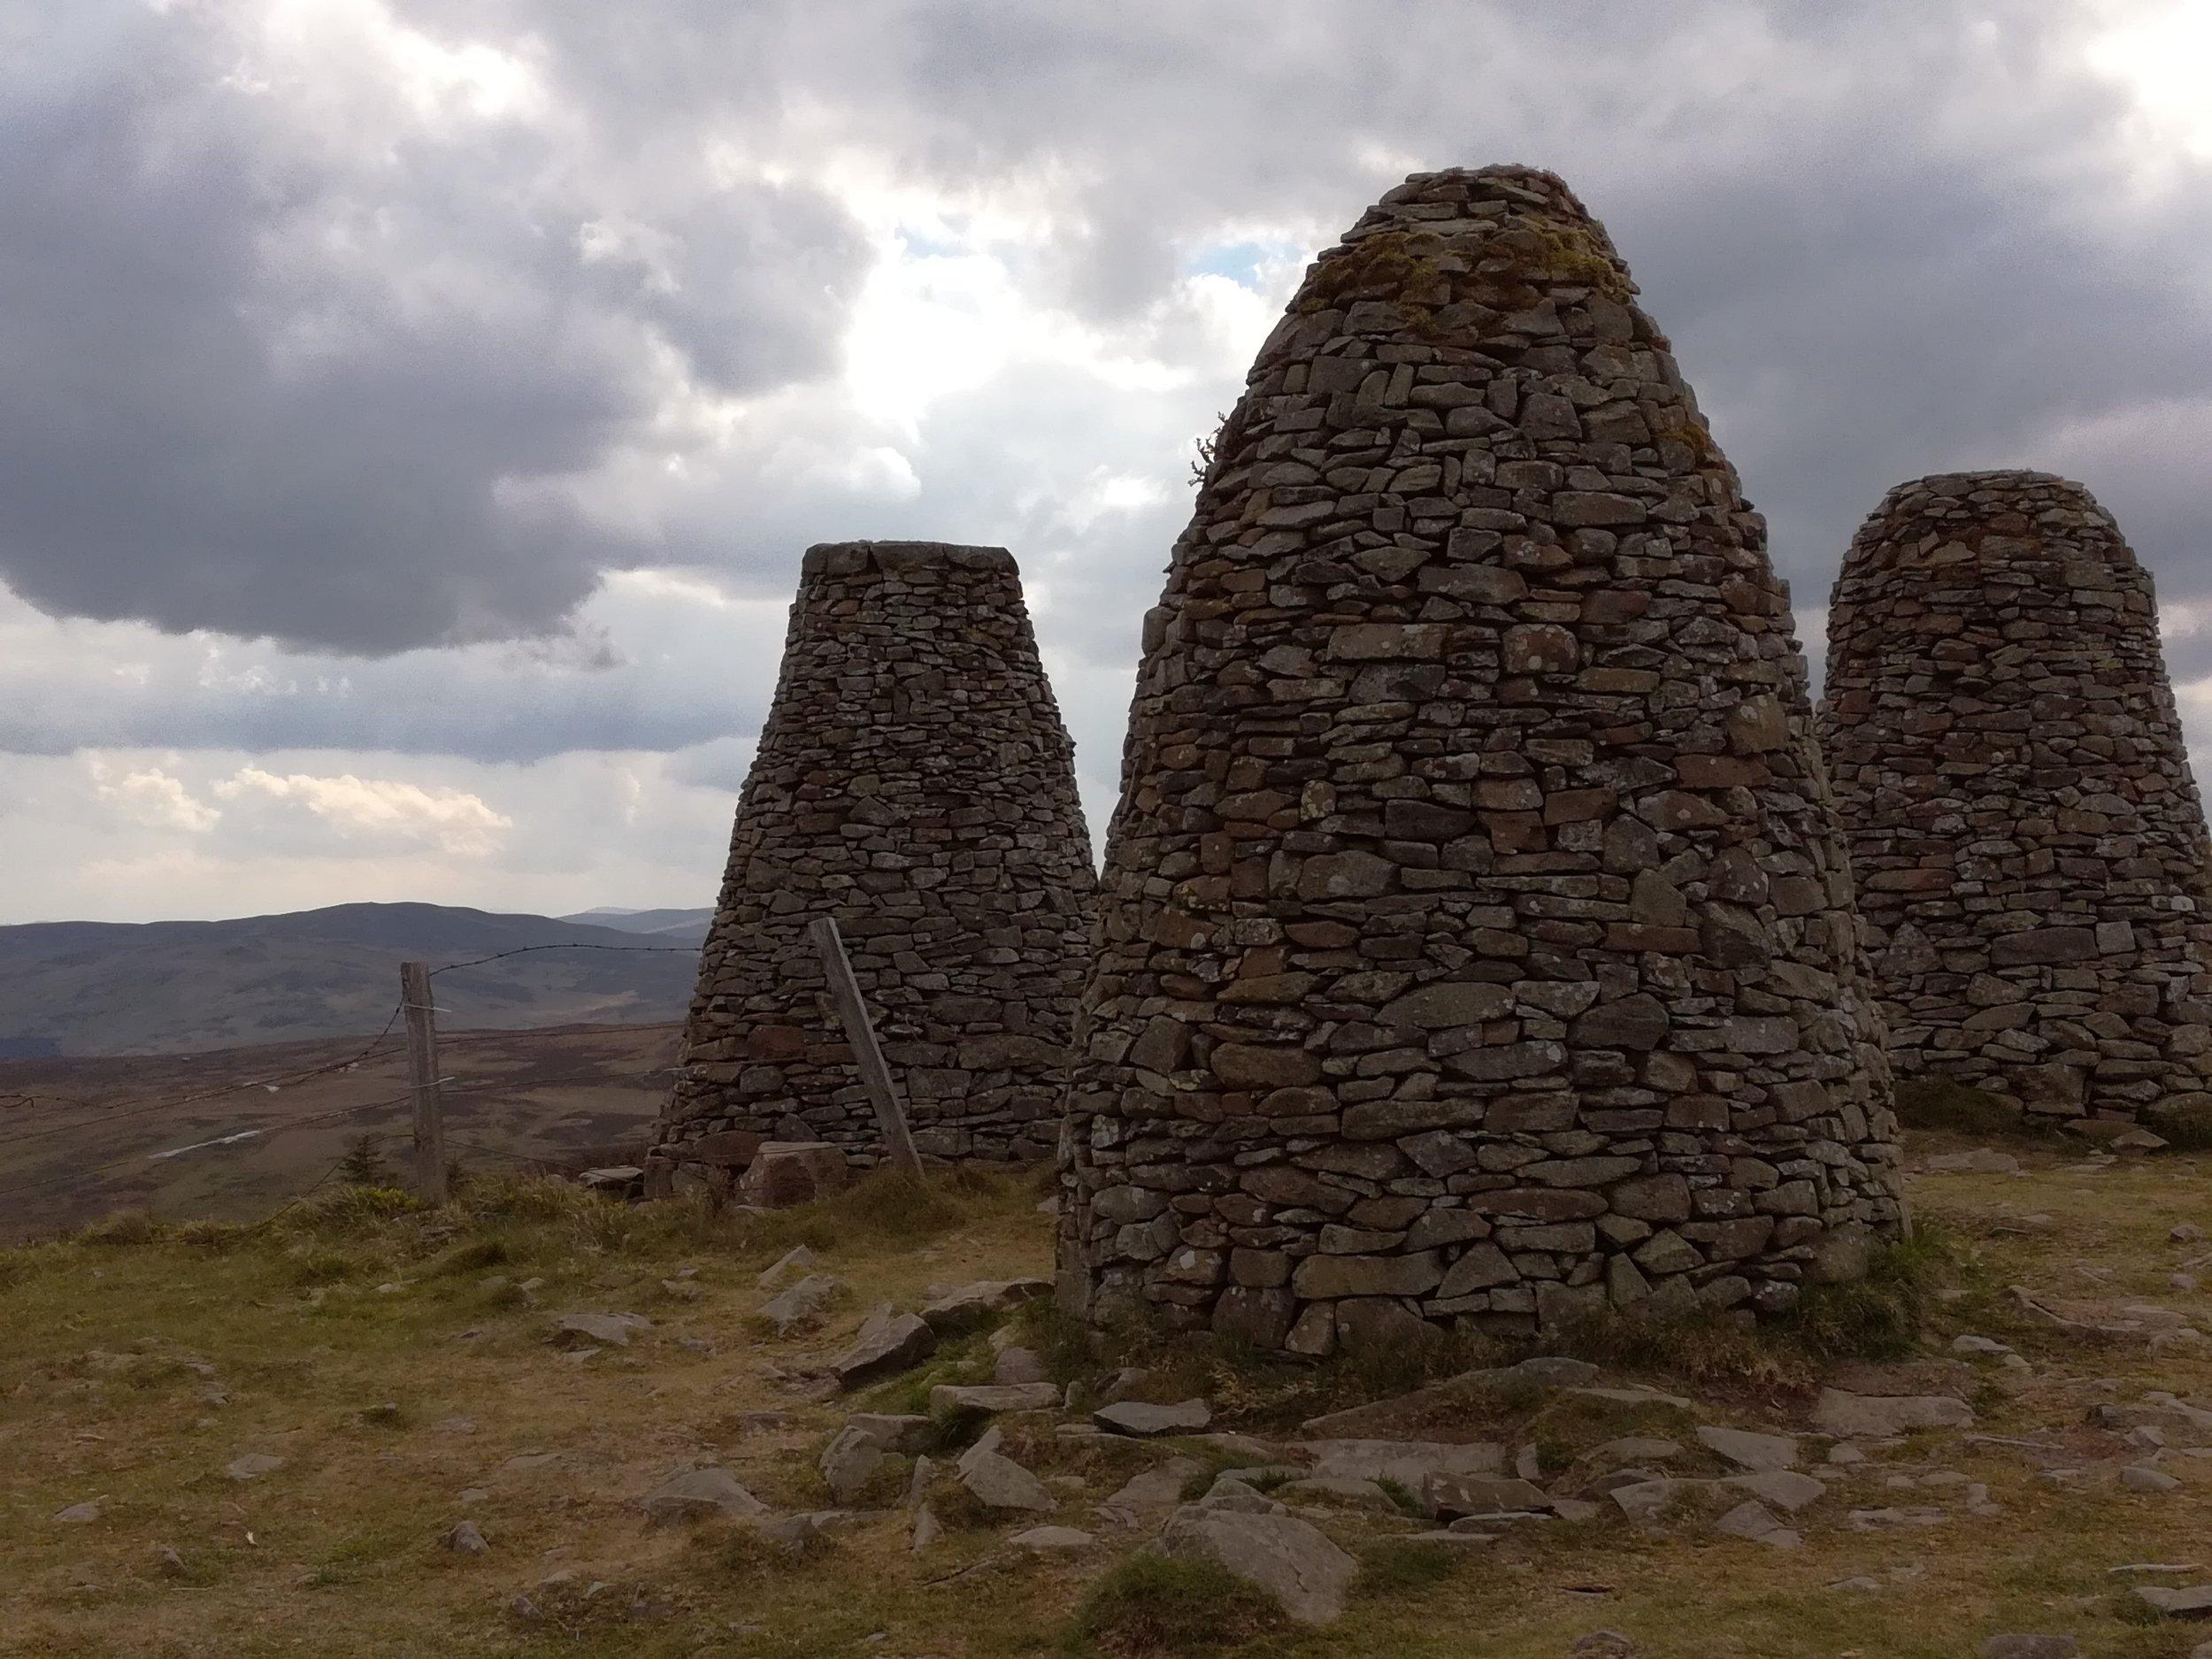 The Three Brethren, Tour & WZalk Scotland in small group adventures - Roaming Scotland. jpg